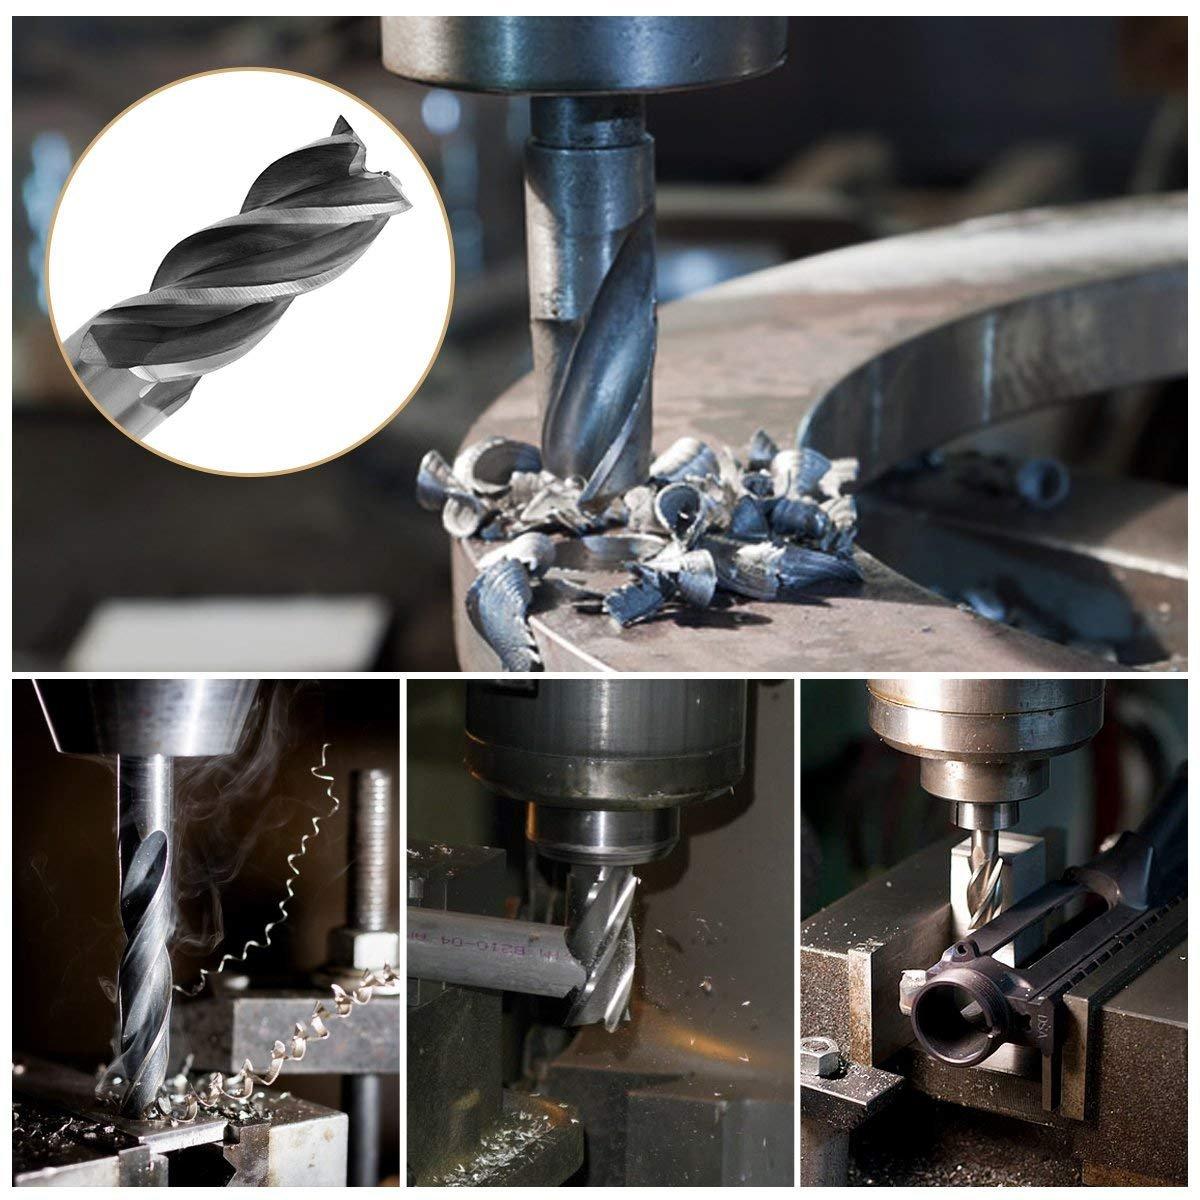 5Pcs End Mill Set, Yosoo HSS CNC 1/8'' End Mill Cutter Drill Bits 1/4'' Shank for Wood, Nylon, Aluminum, Steel,Titanium, 4 Flute Straight End Mill Set 1/8'' - 1/4''